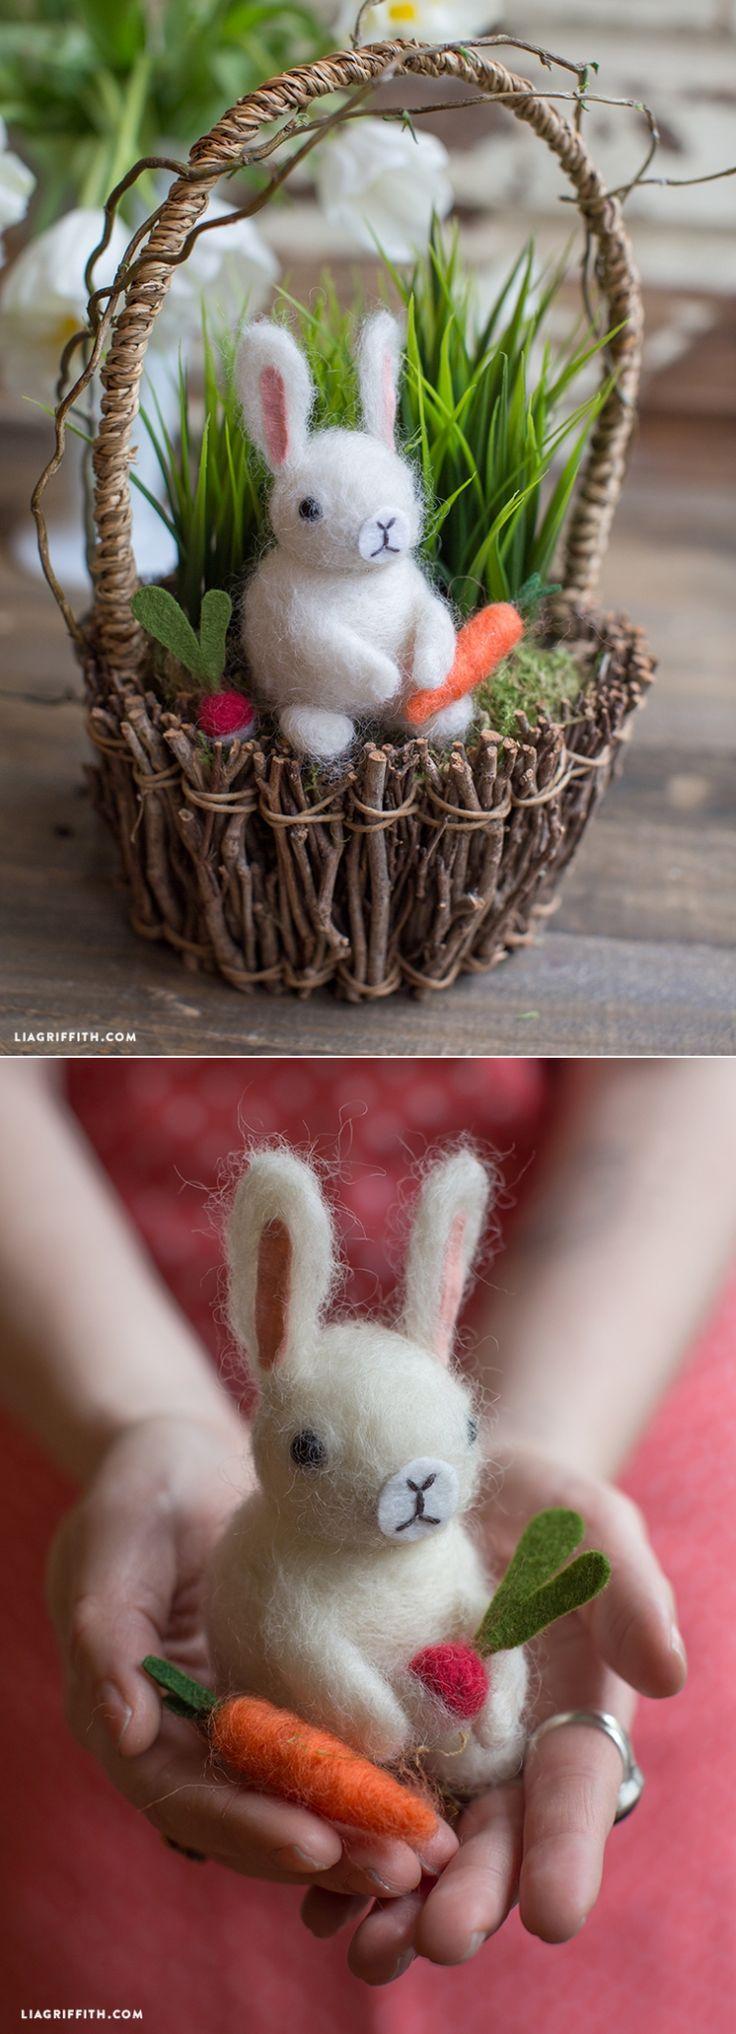 #Felted #Feltcraft #EasterBunny #EasterCraft #EasterDecor www.LiaGriffith.com: